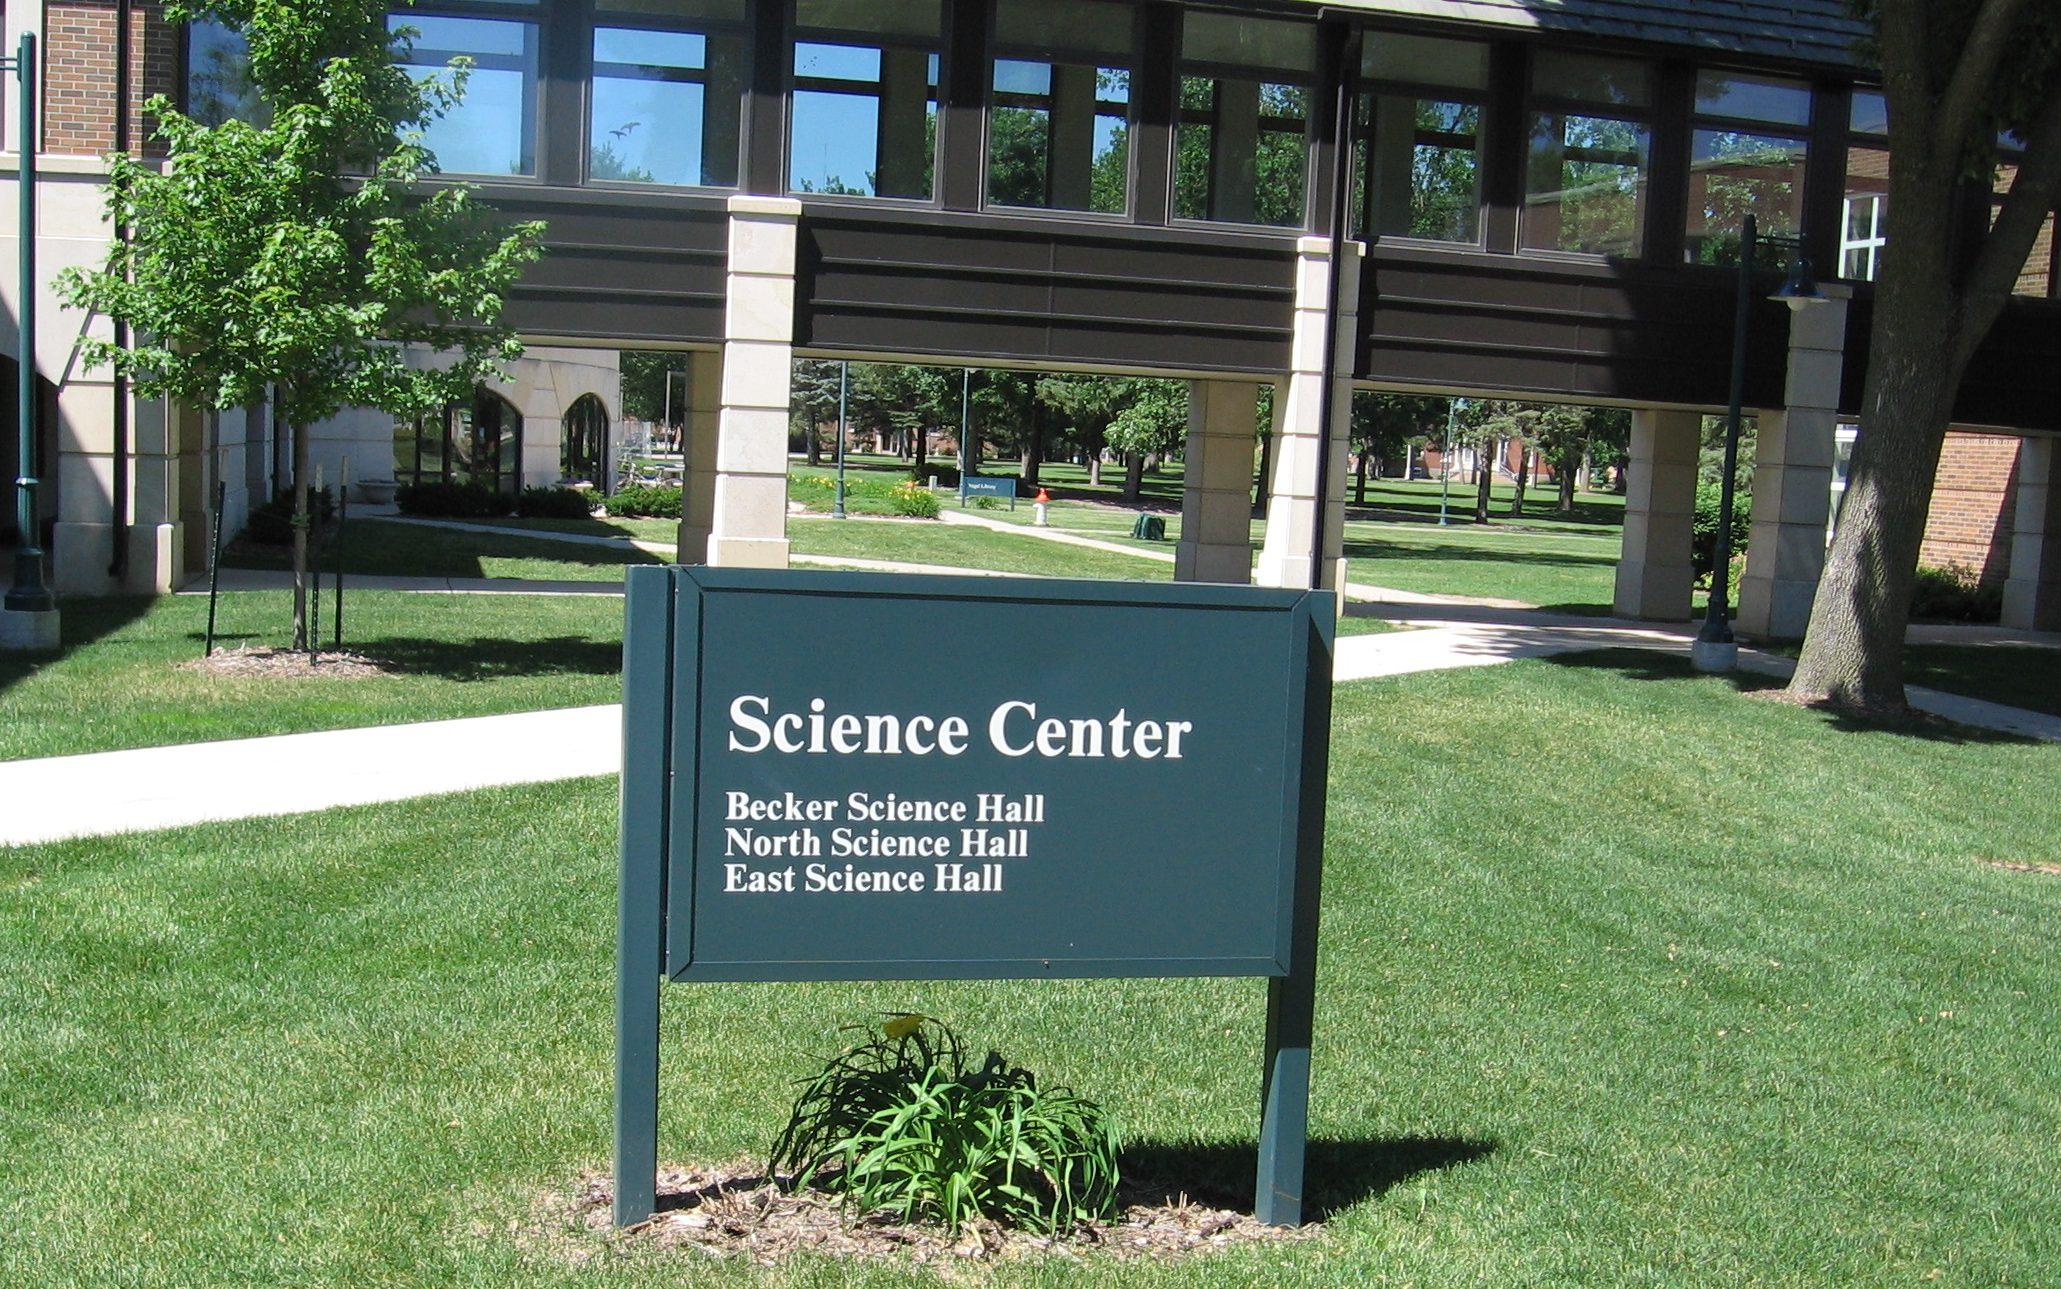 Science Center Dir